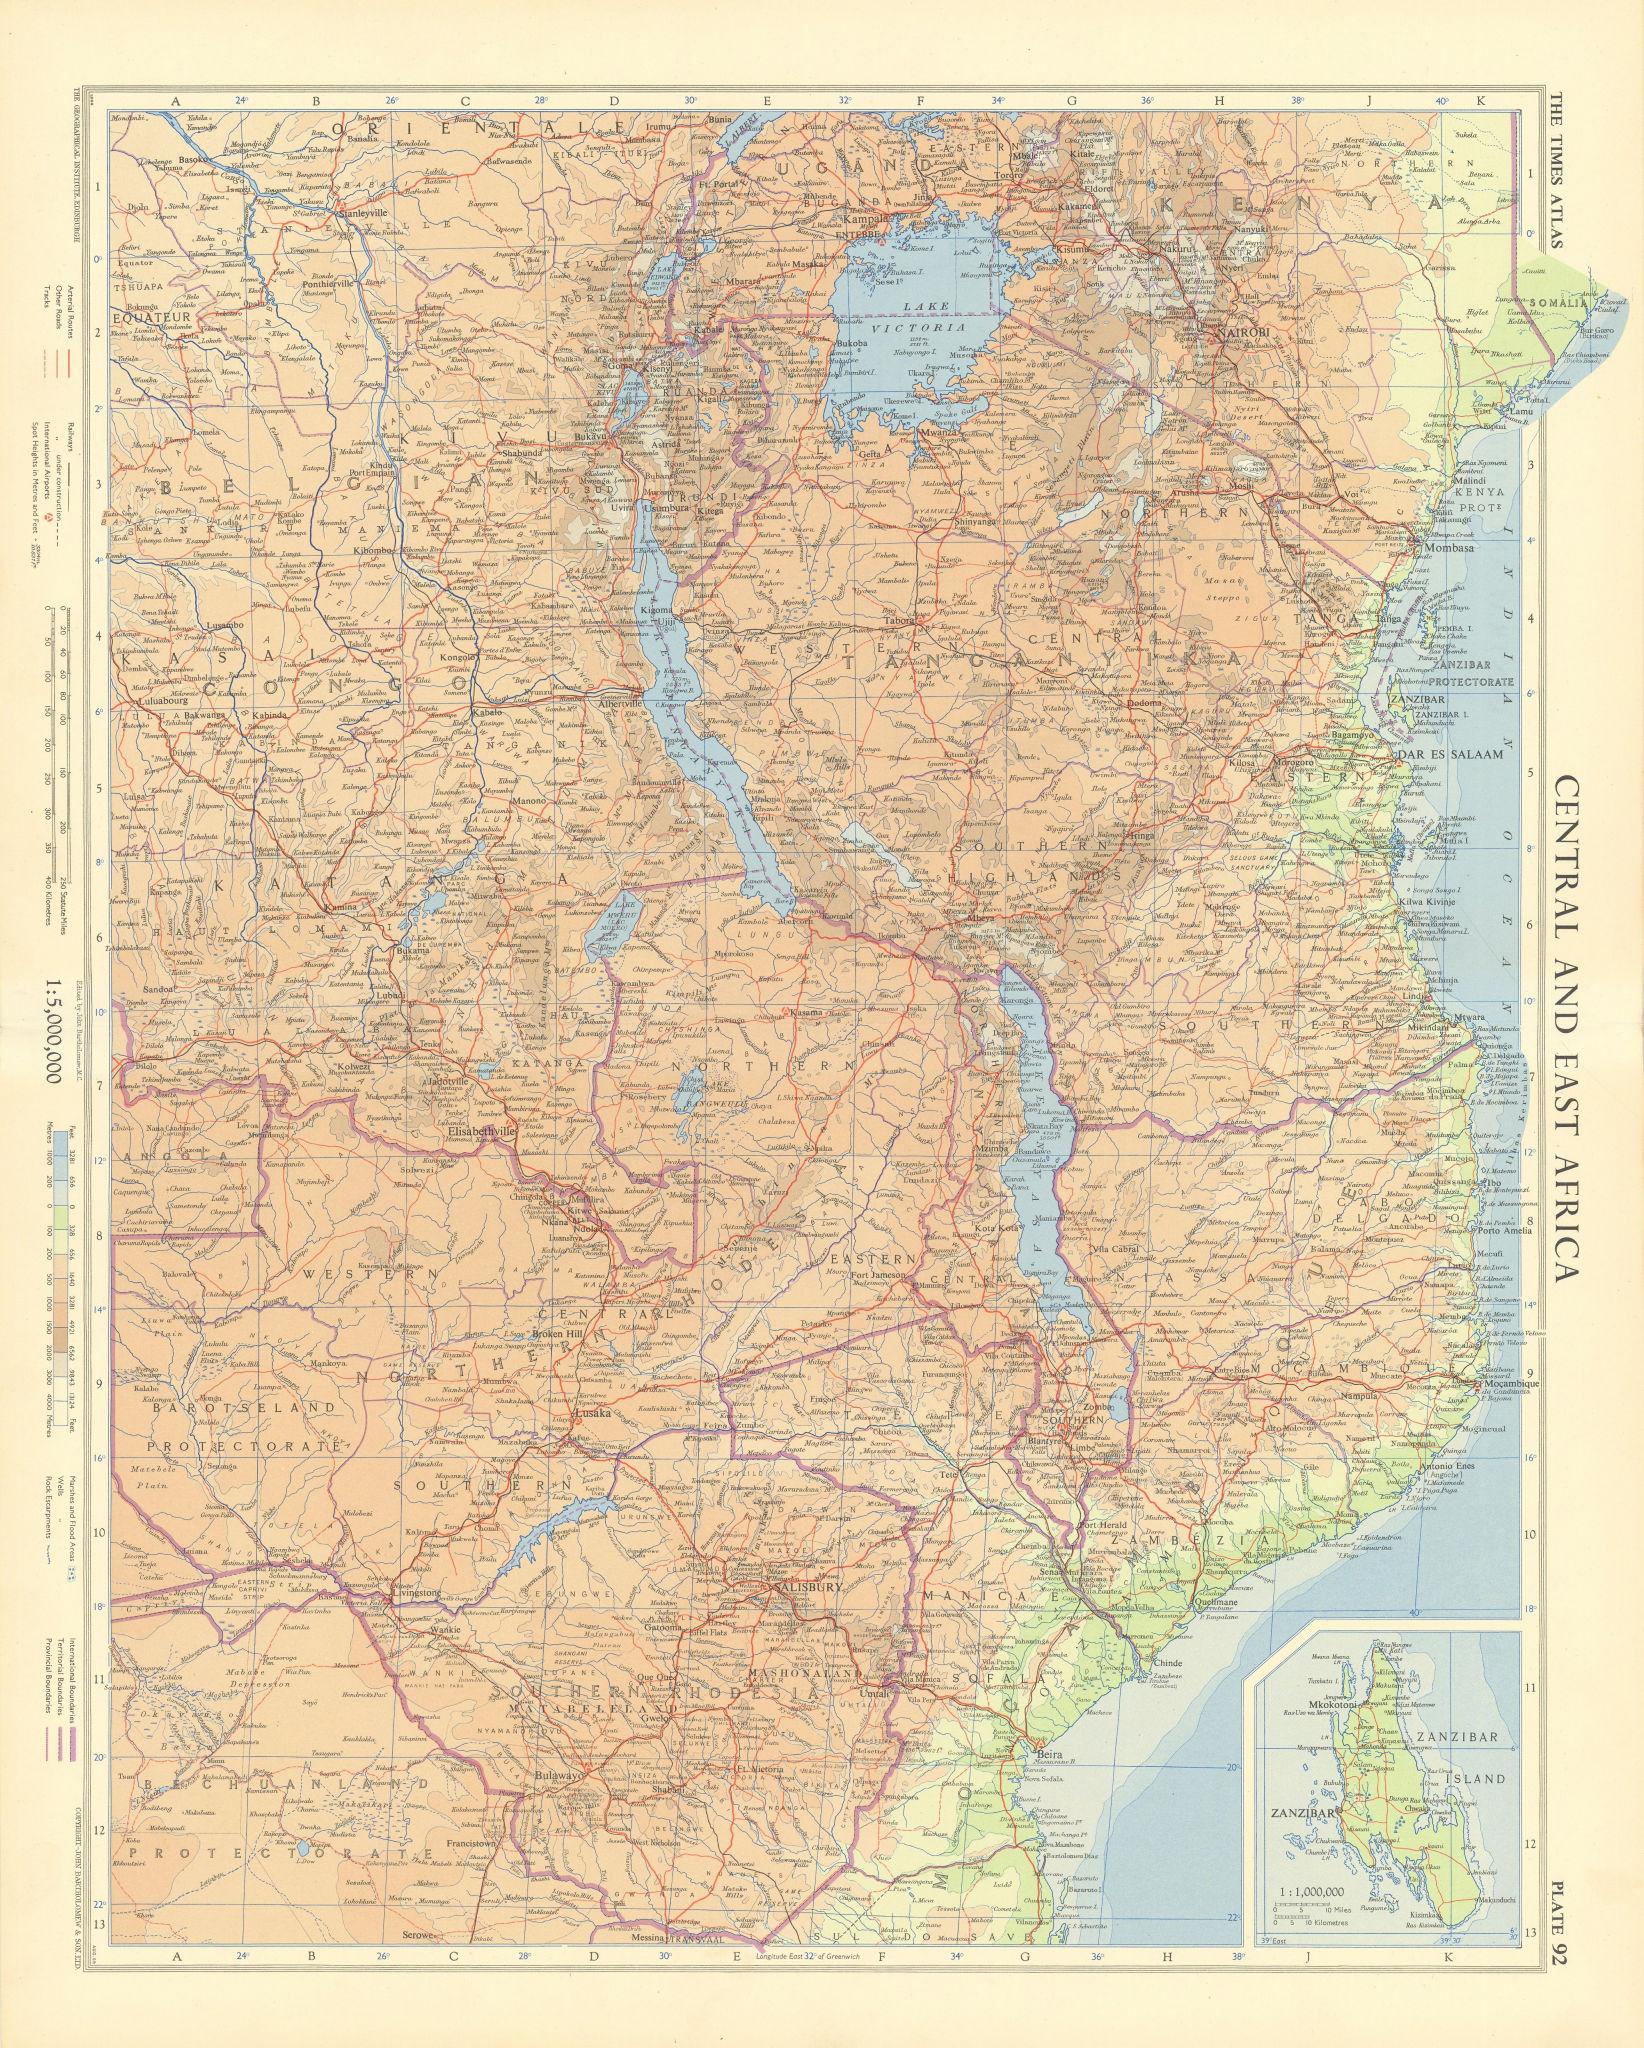 Central & East Africa. Zanzibar Tanganyika Rhodesia Congo. TIMES 1956 old map